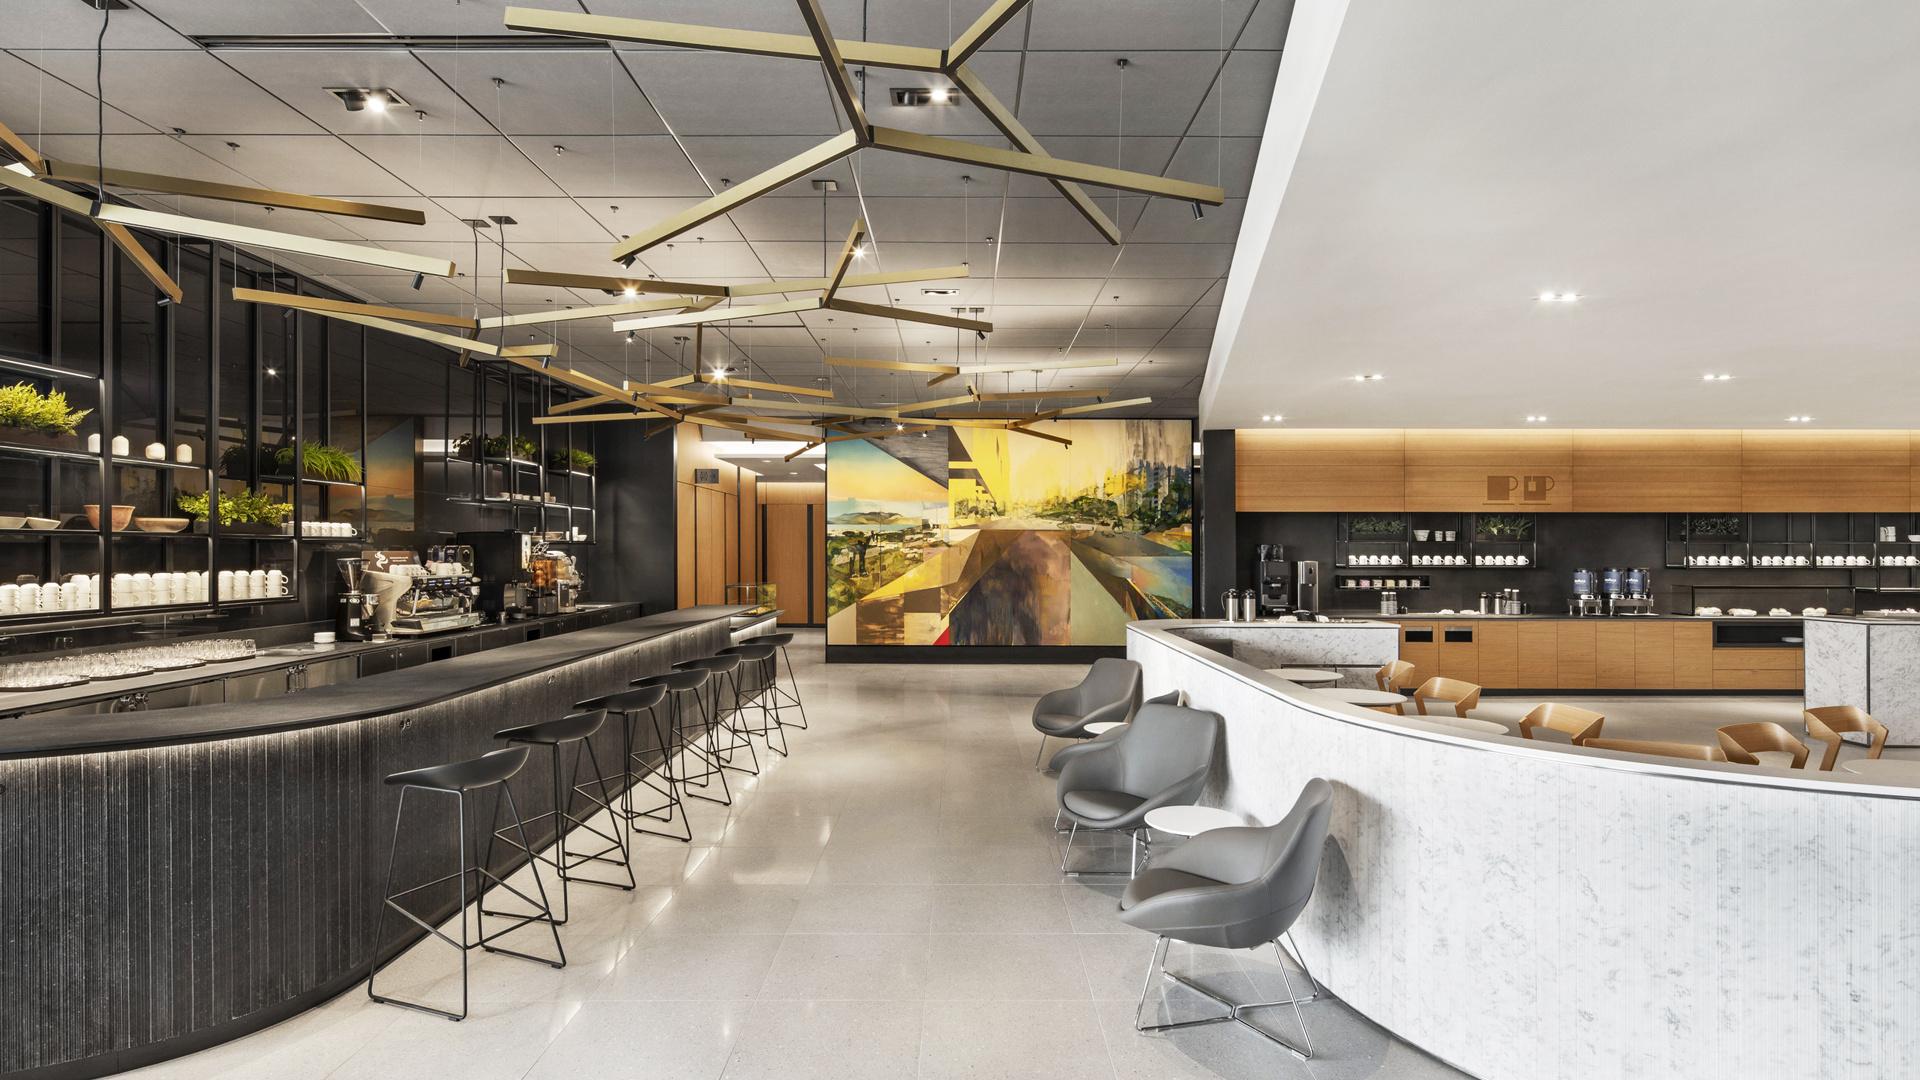 Air Canada Café